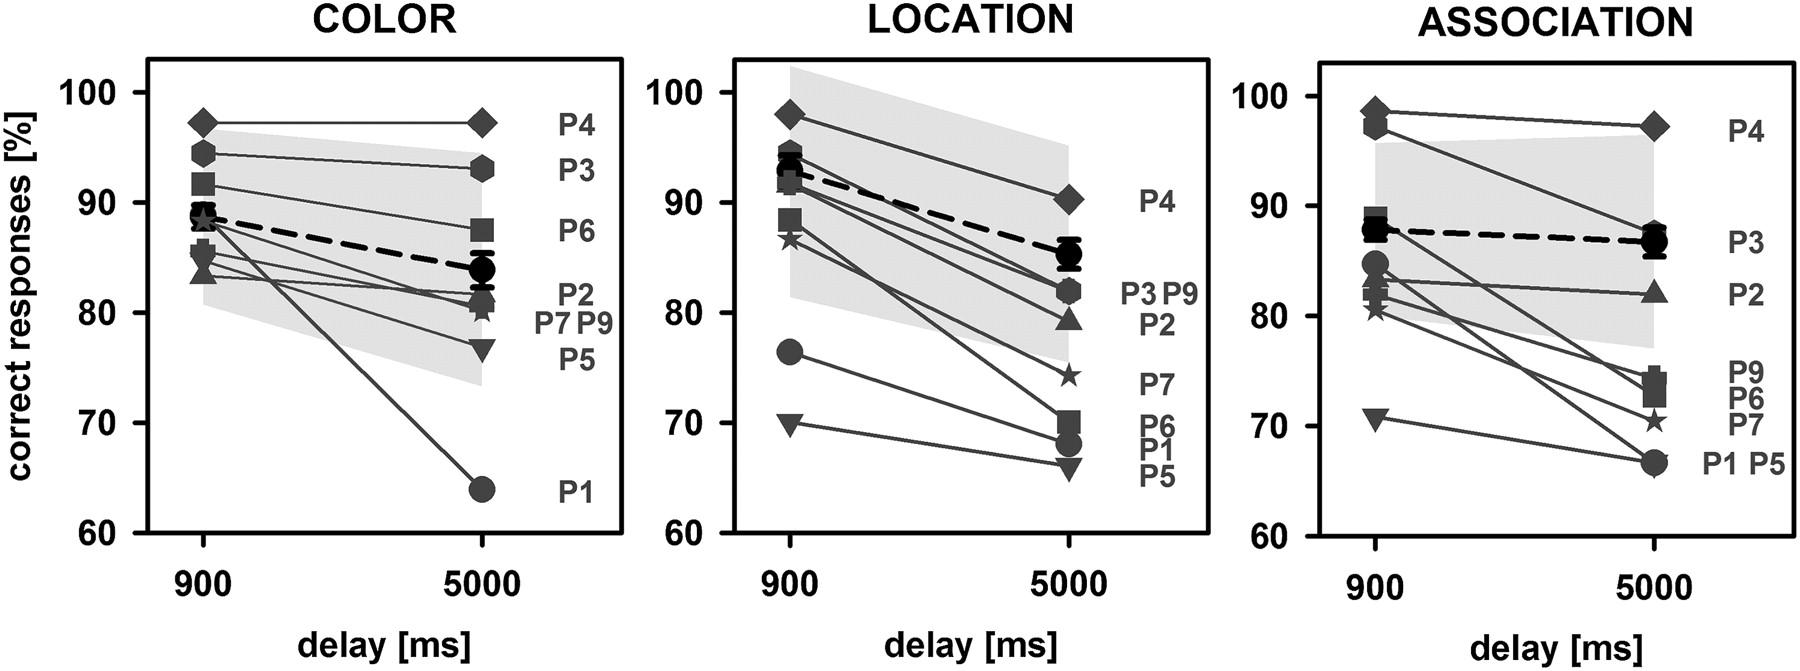 Cognitive deficits following anti-NMDA receptor